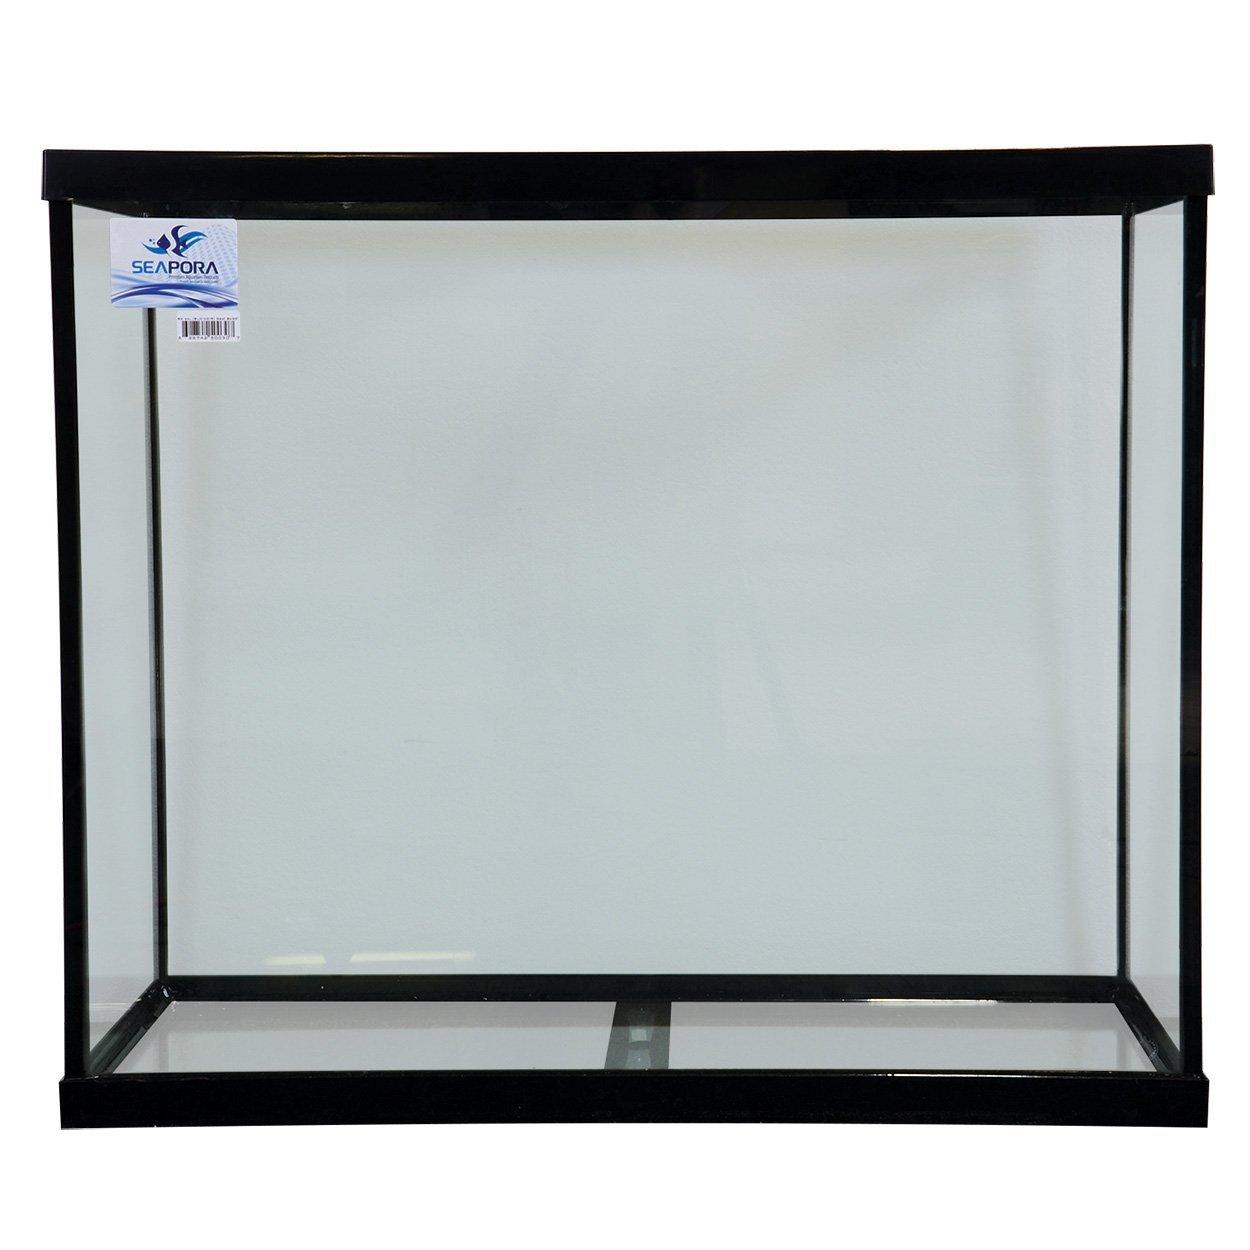 Seapora 59215 Standard Aquarium, 84 gallon $98.24+free shipping